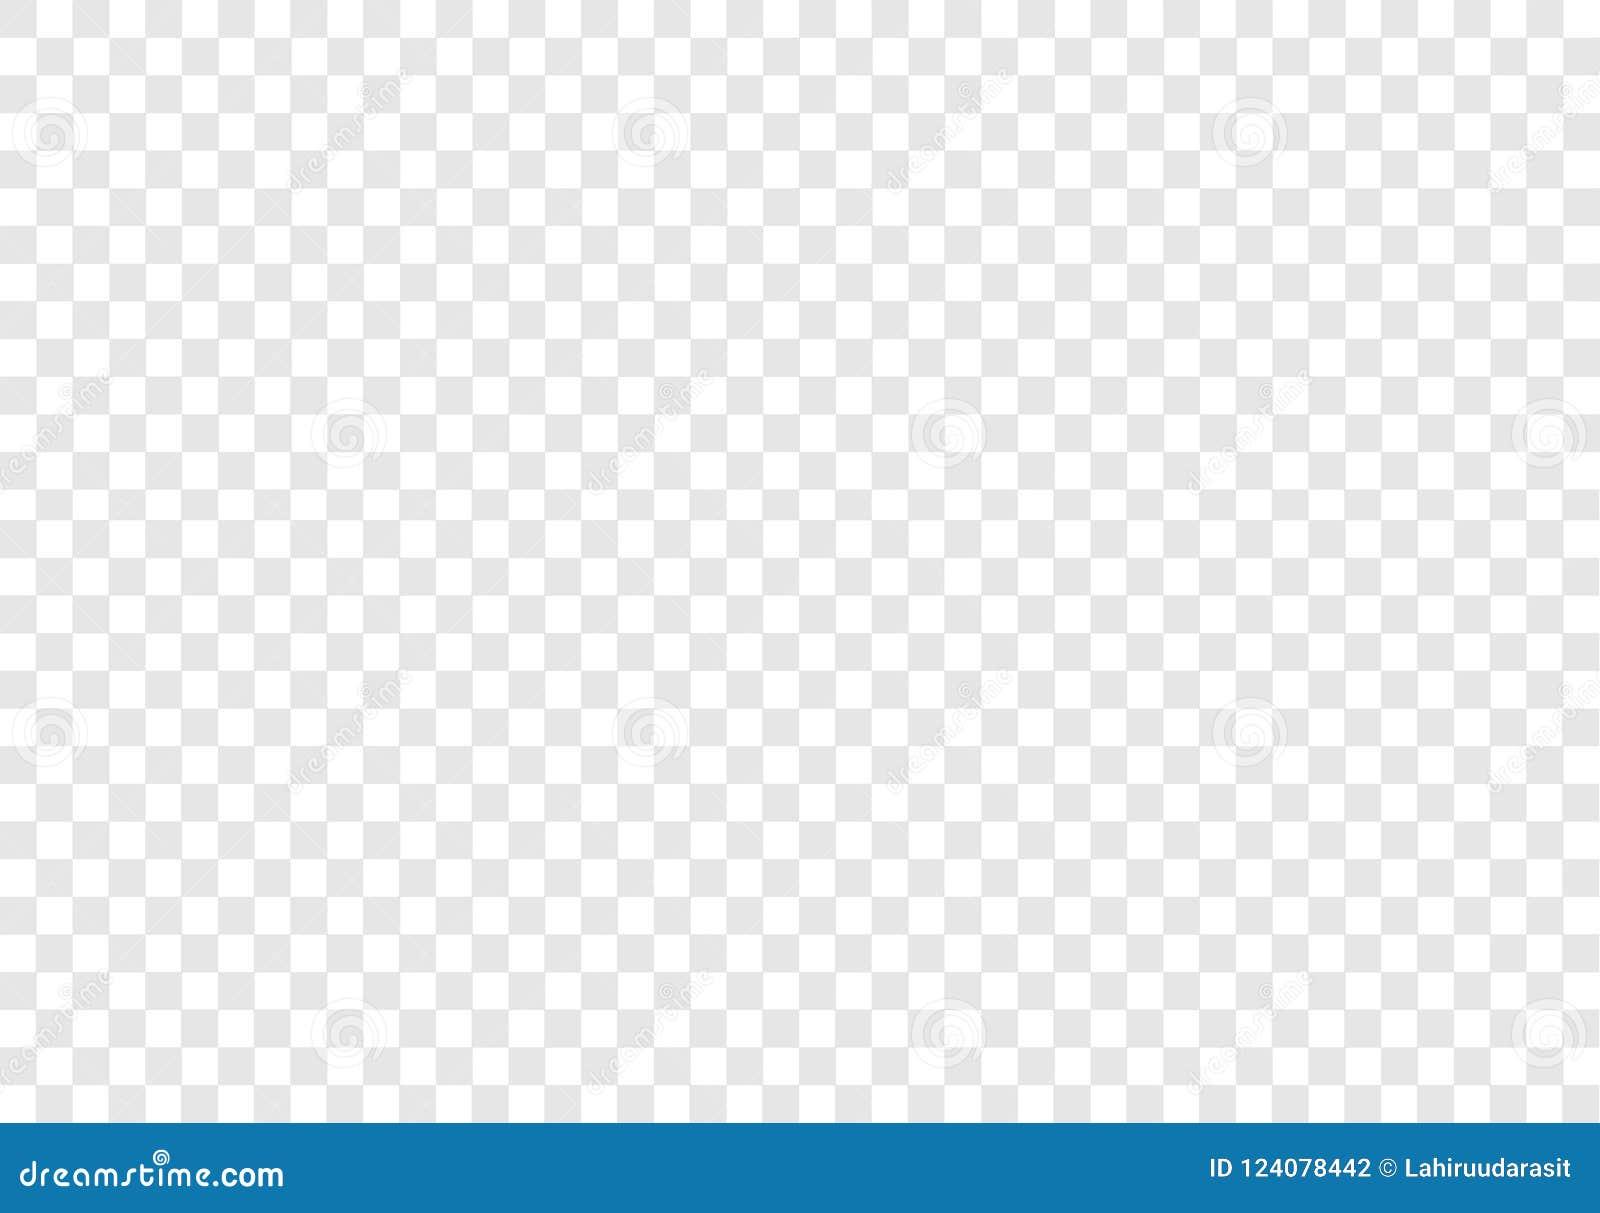 Quadratisches Formhintergrundmuster